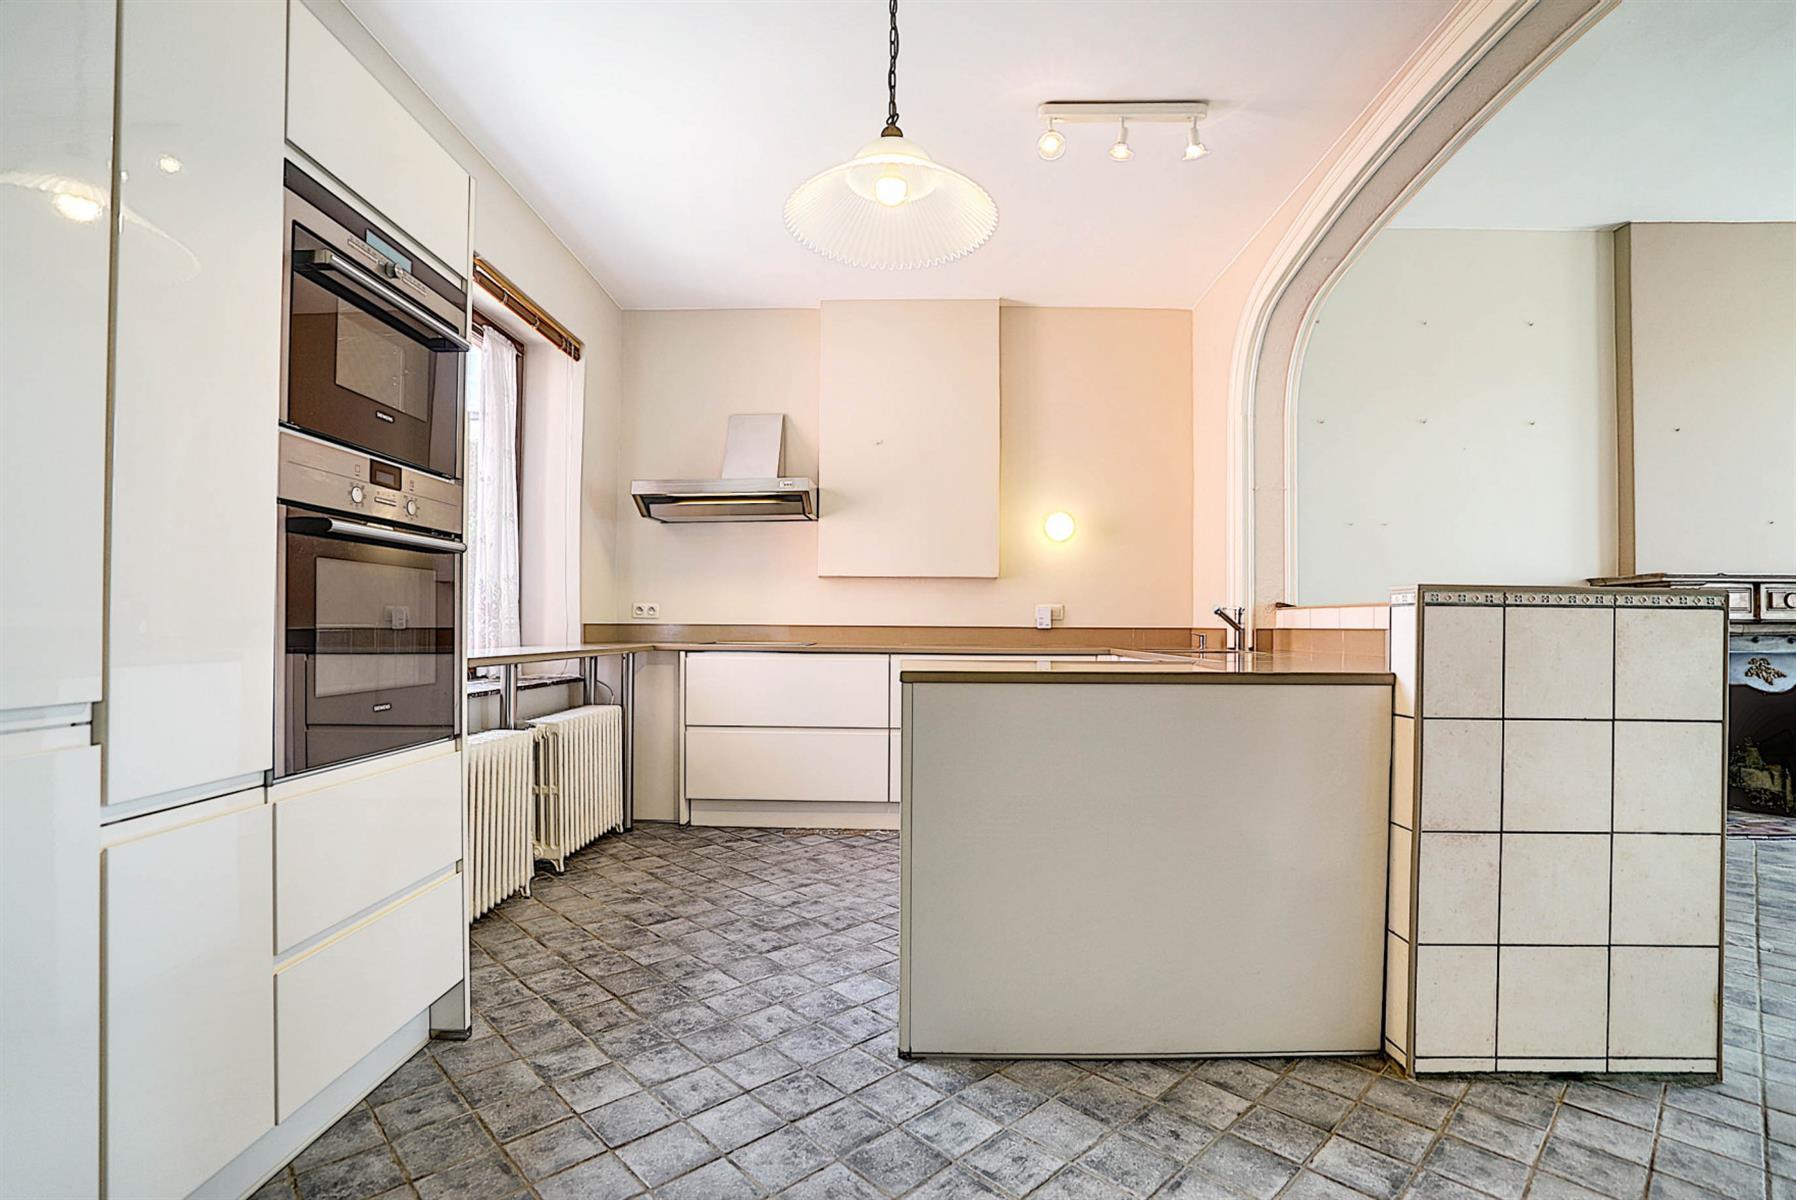 Maison - Bousval - #4131618-2